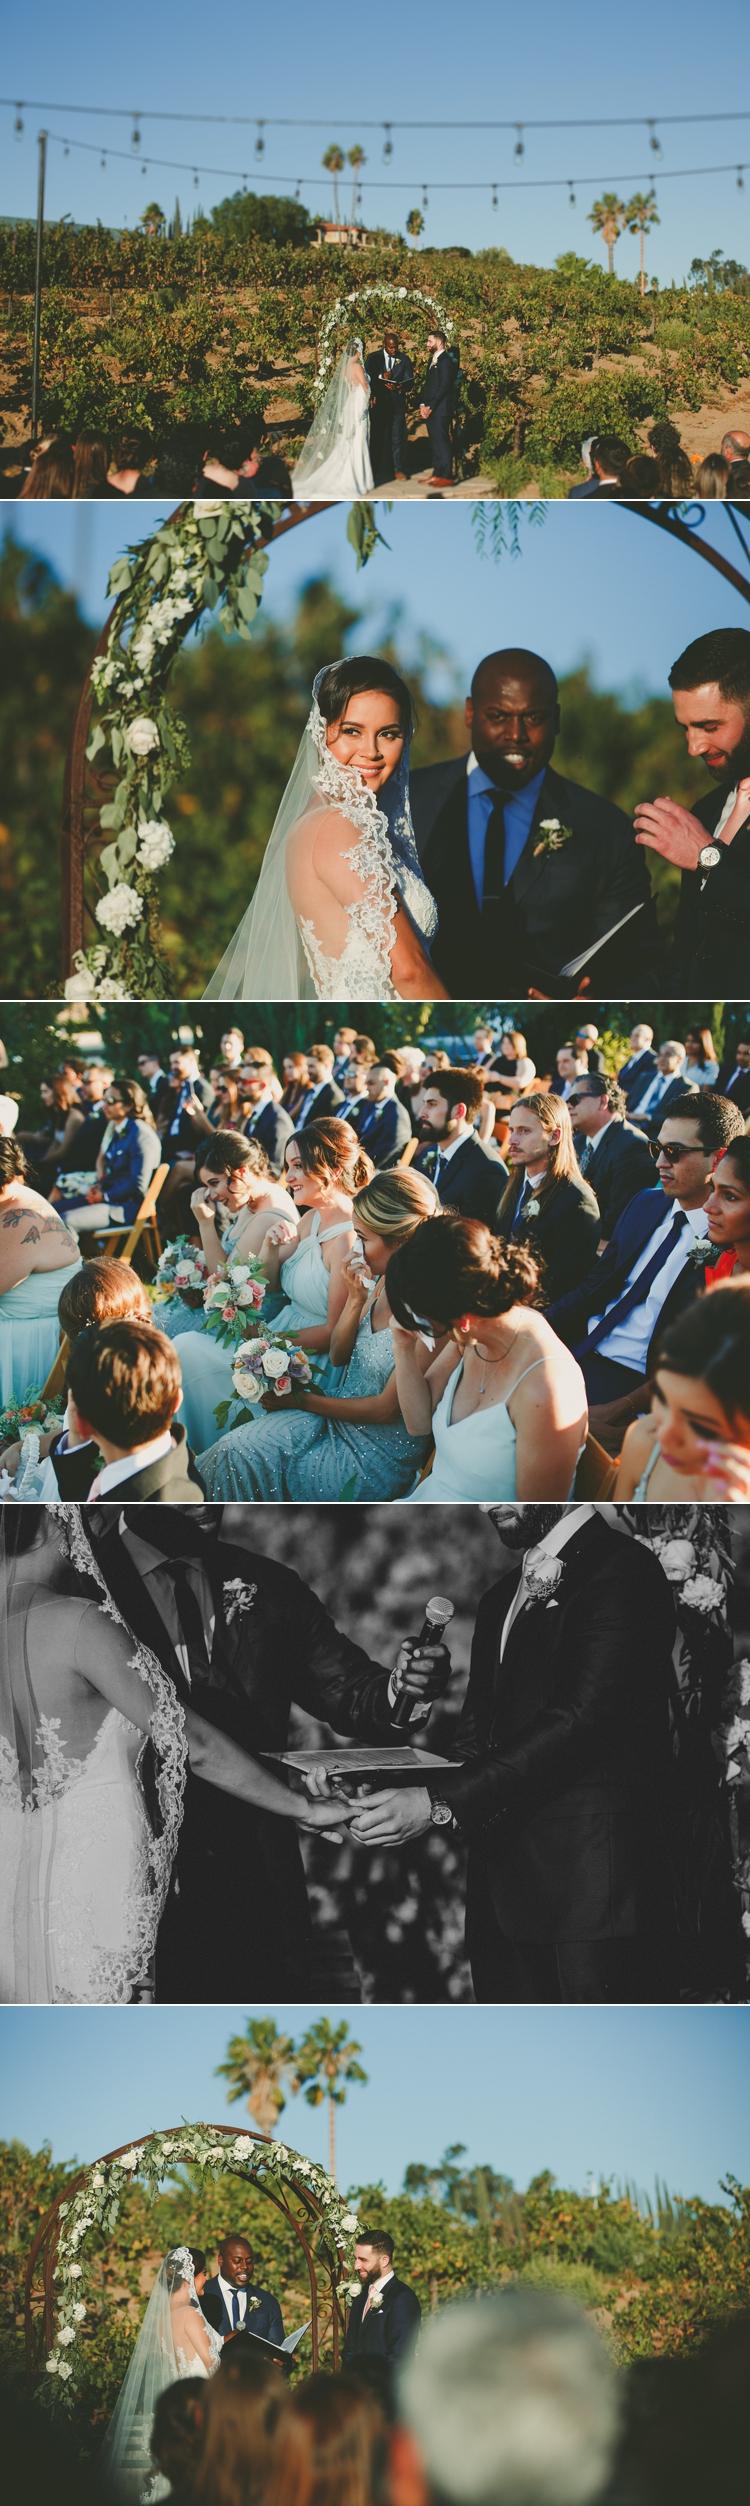 europa-village-winery-wedding-8